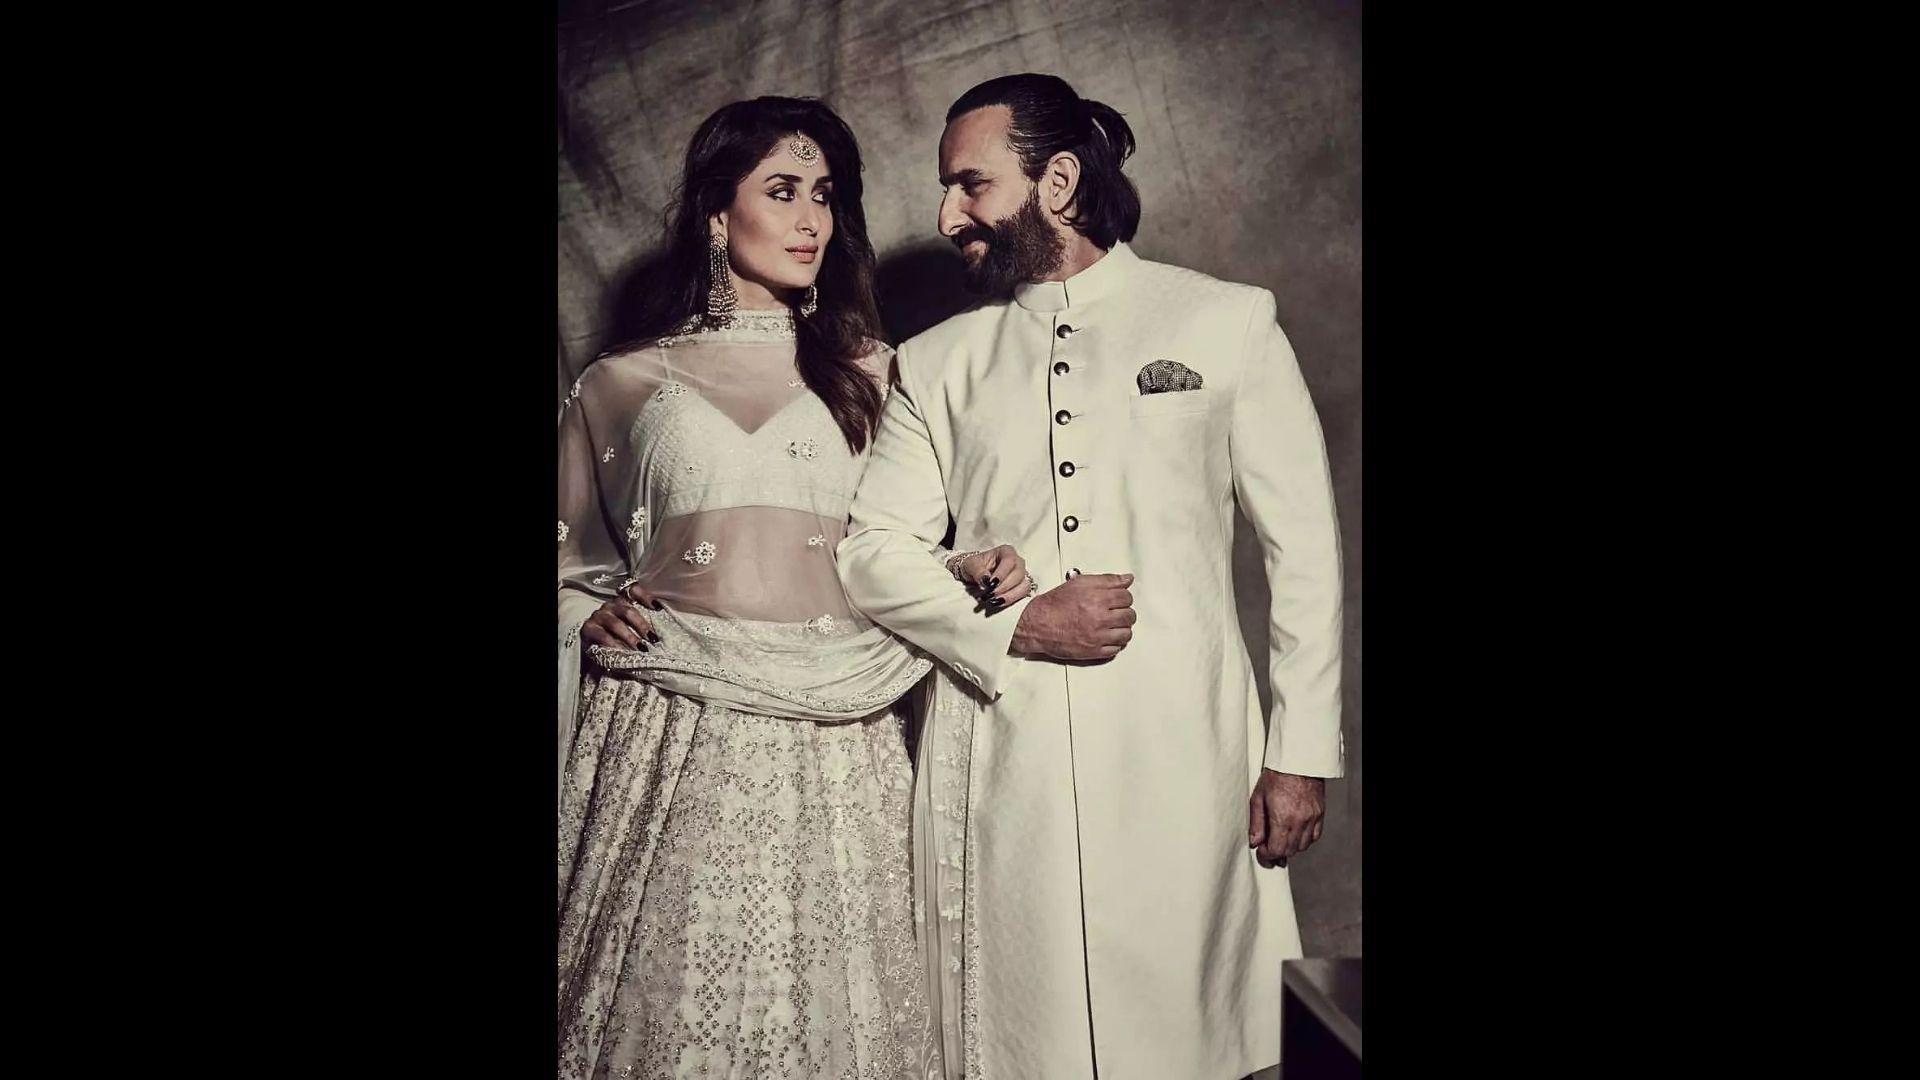 Kareena Kapoor Khan And Saif Ali Khan Anniversary: Bebo Wanted A Low-key Wedding Reveals Father Randhir Kapoor